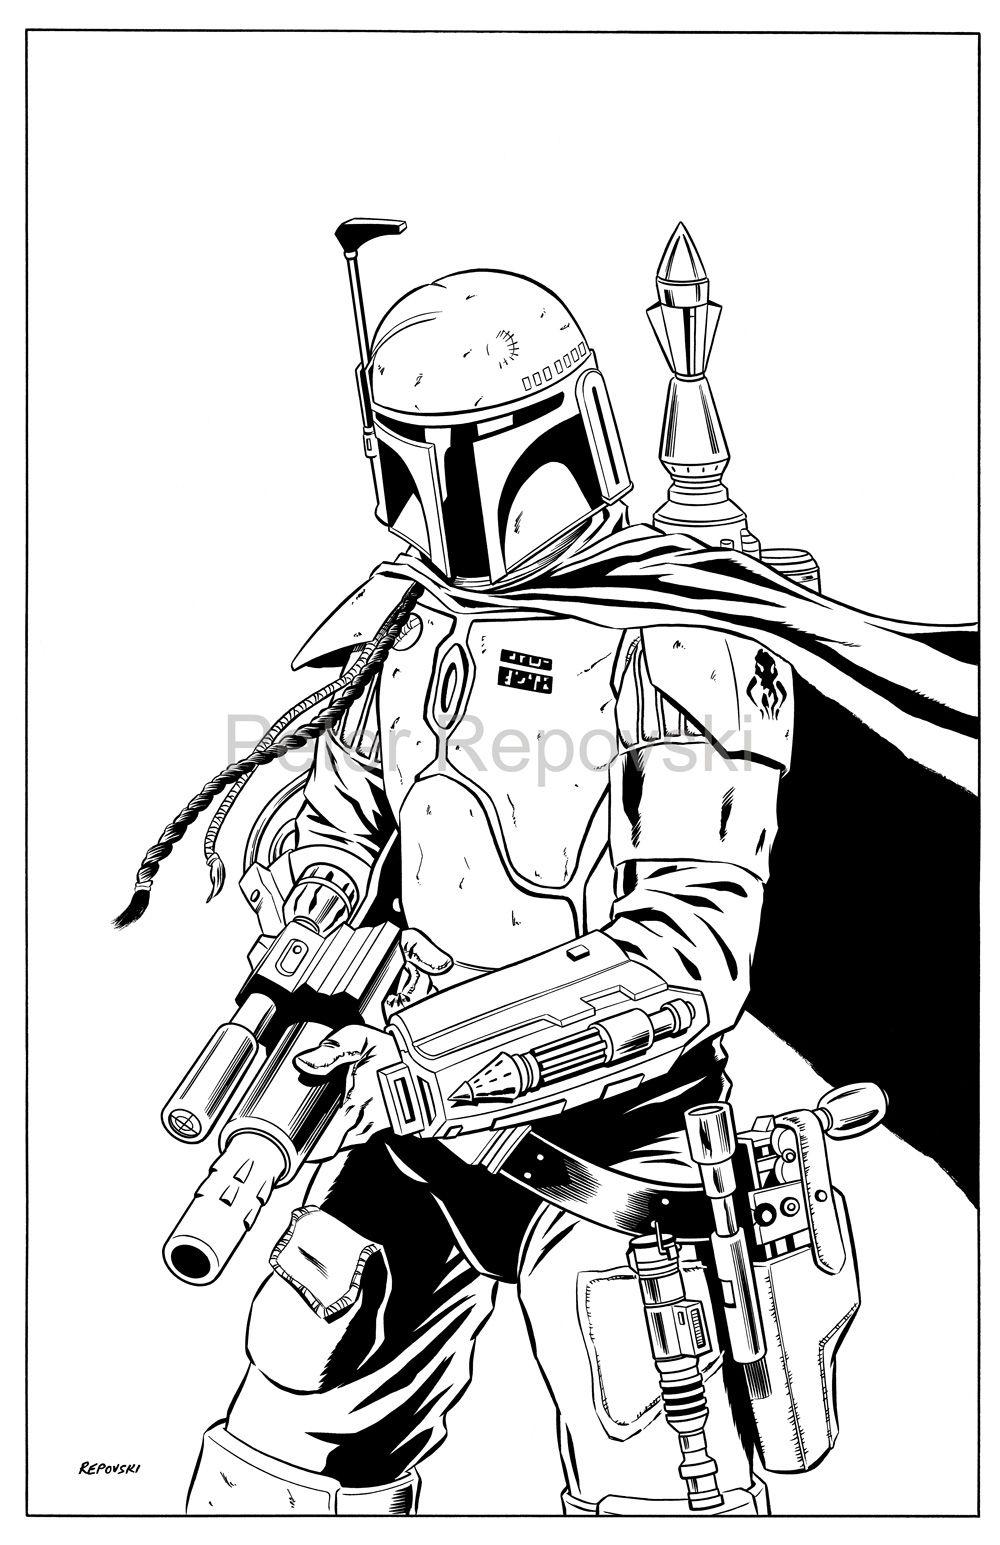 Pin by Dawn Gilliland on Star wars Star wars cards, Star